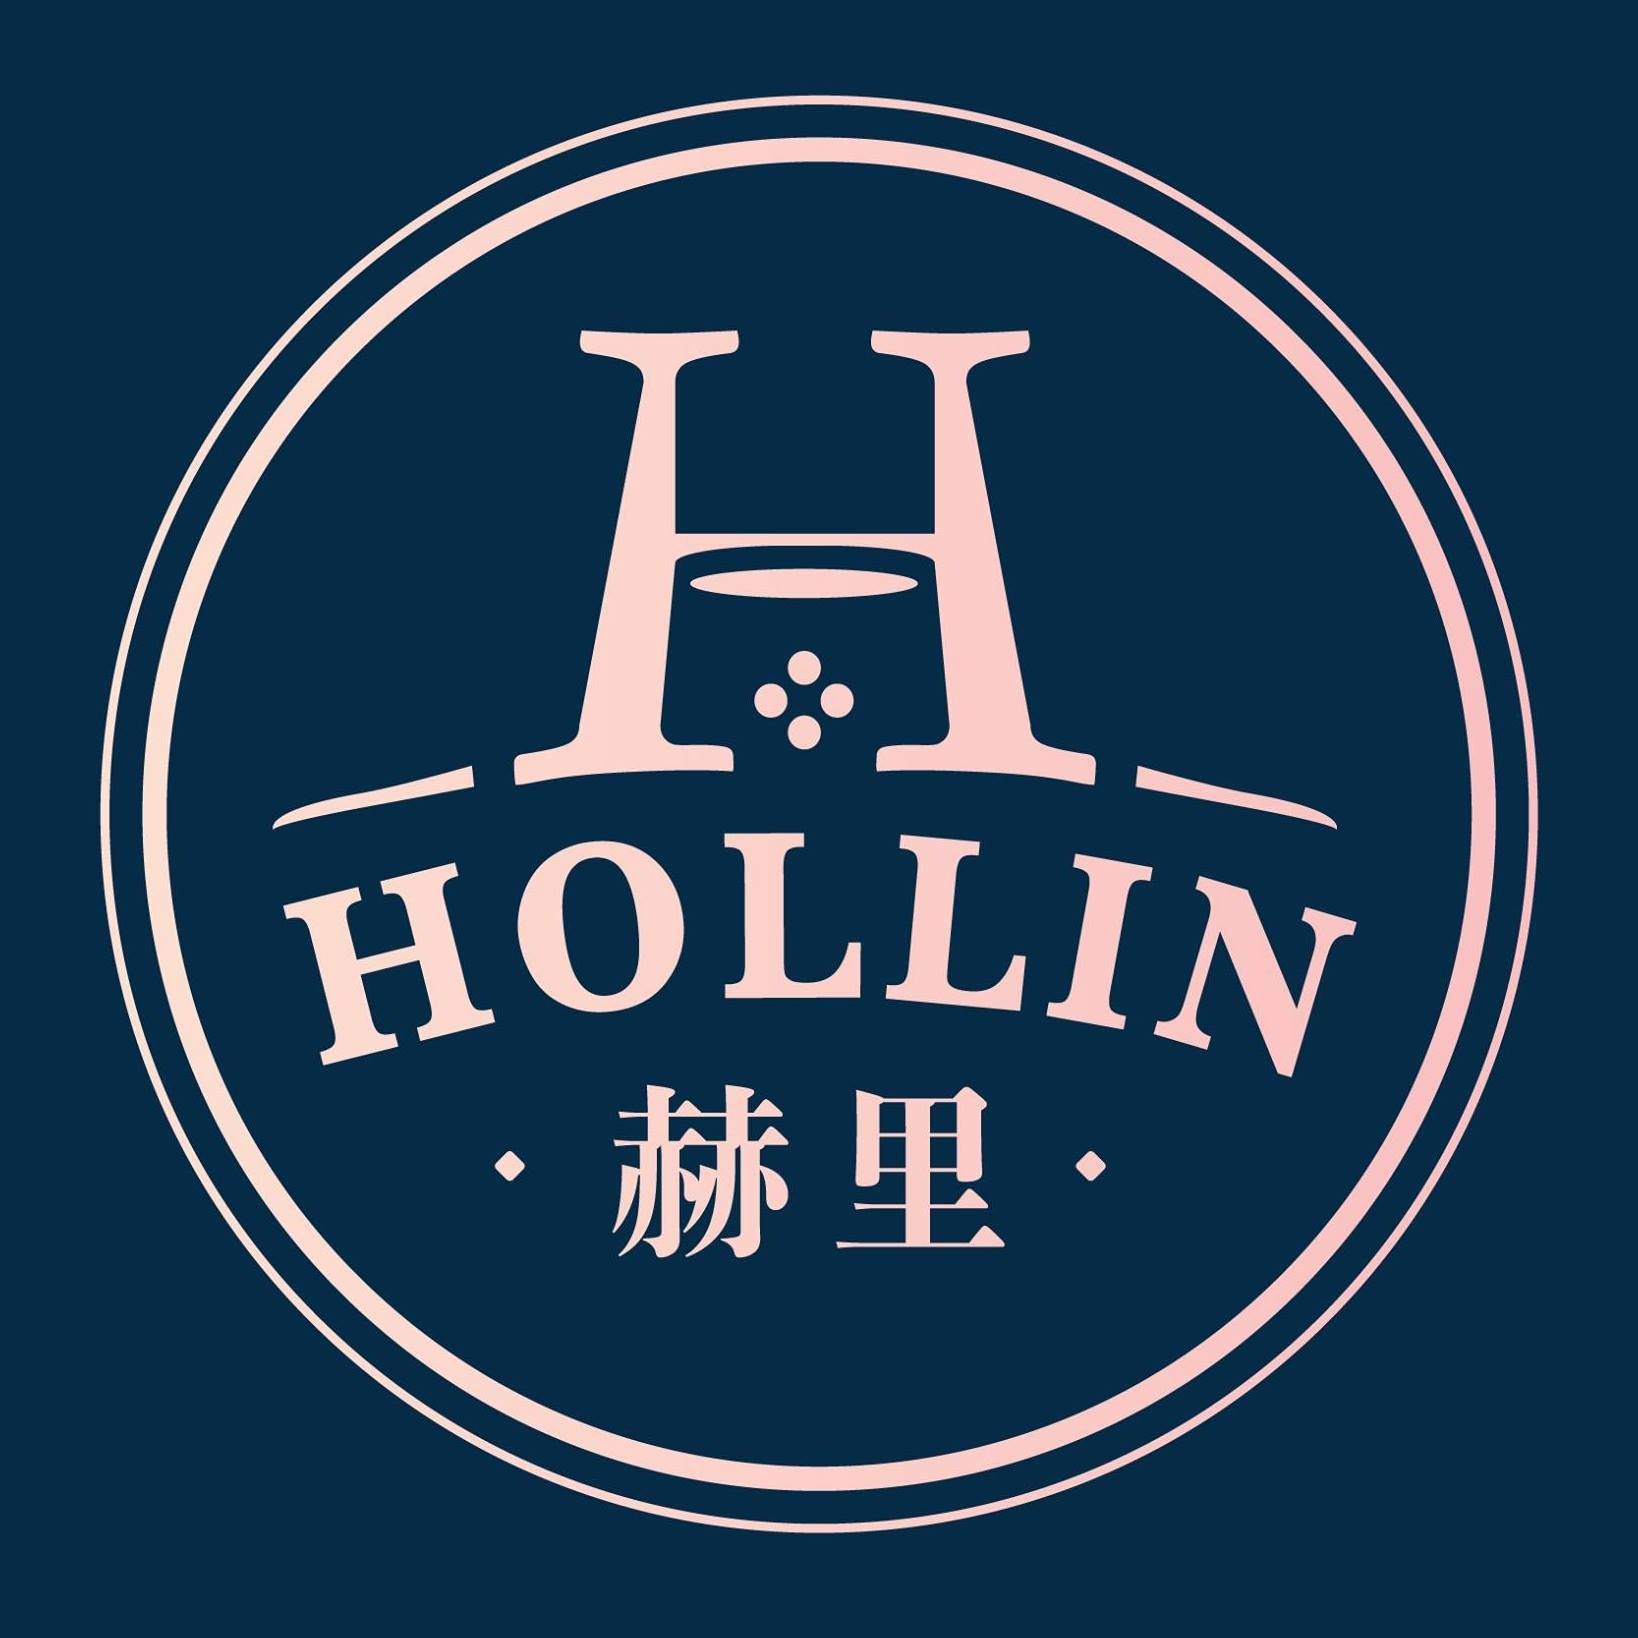 $2 Cash Voucher at Hollin - Get Deals, Cashback and Rewards with ShopBack GO